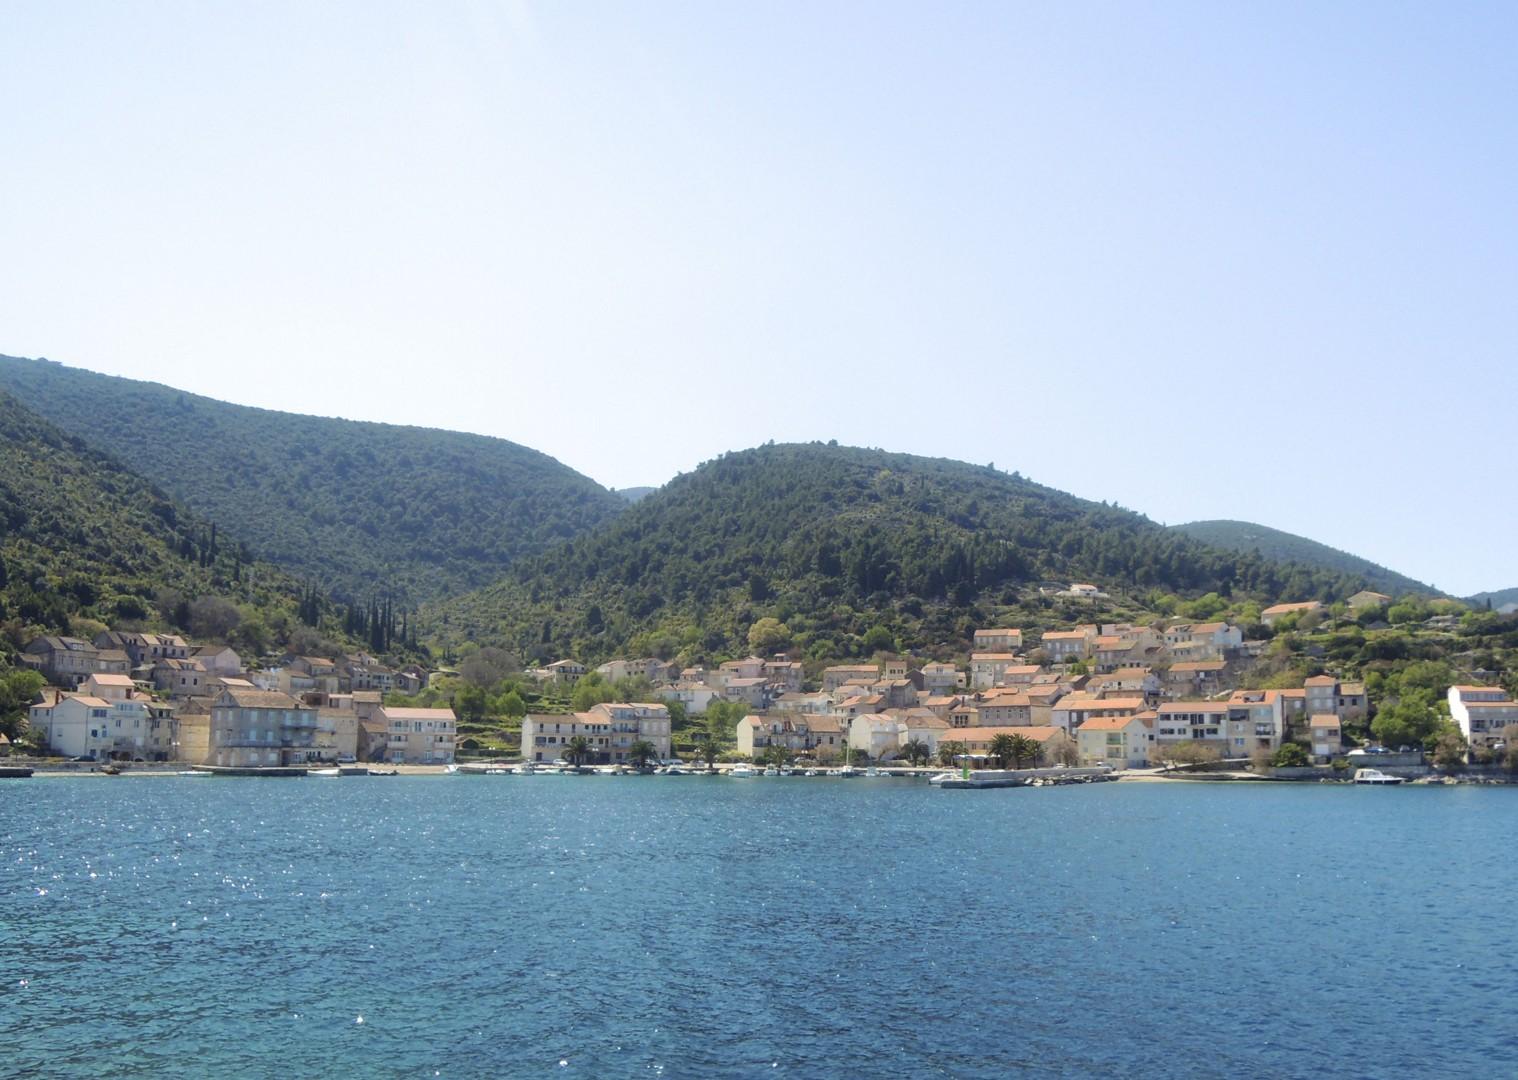 croatiaroad6.jpg - Slovenia and Croatia - Slovenian Alps to Dalmatian Coast - Guided Road Cycling Holiday - Road Cycling